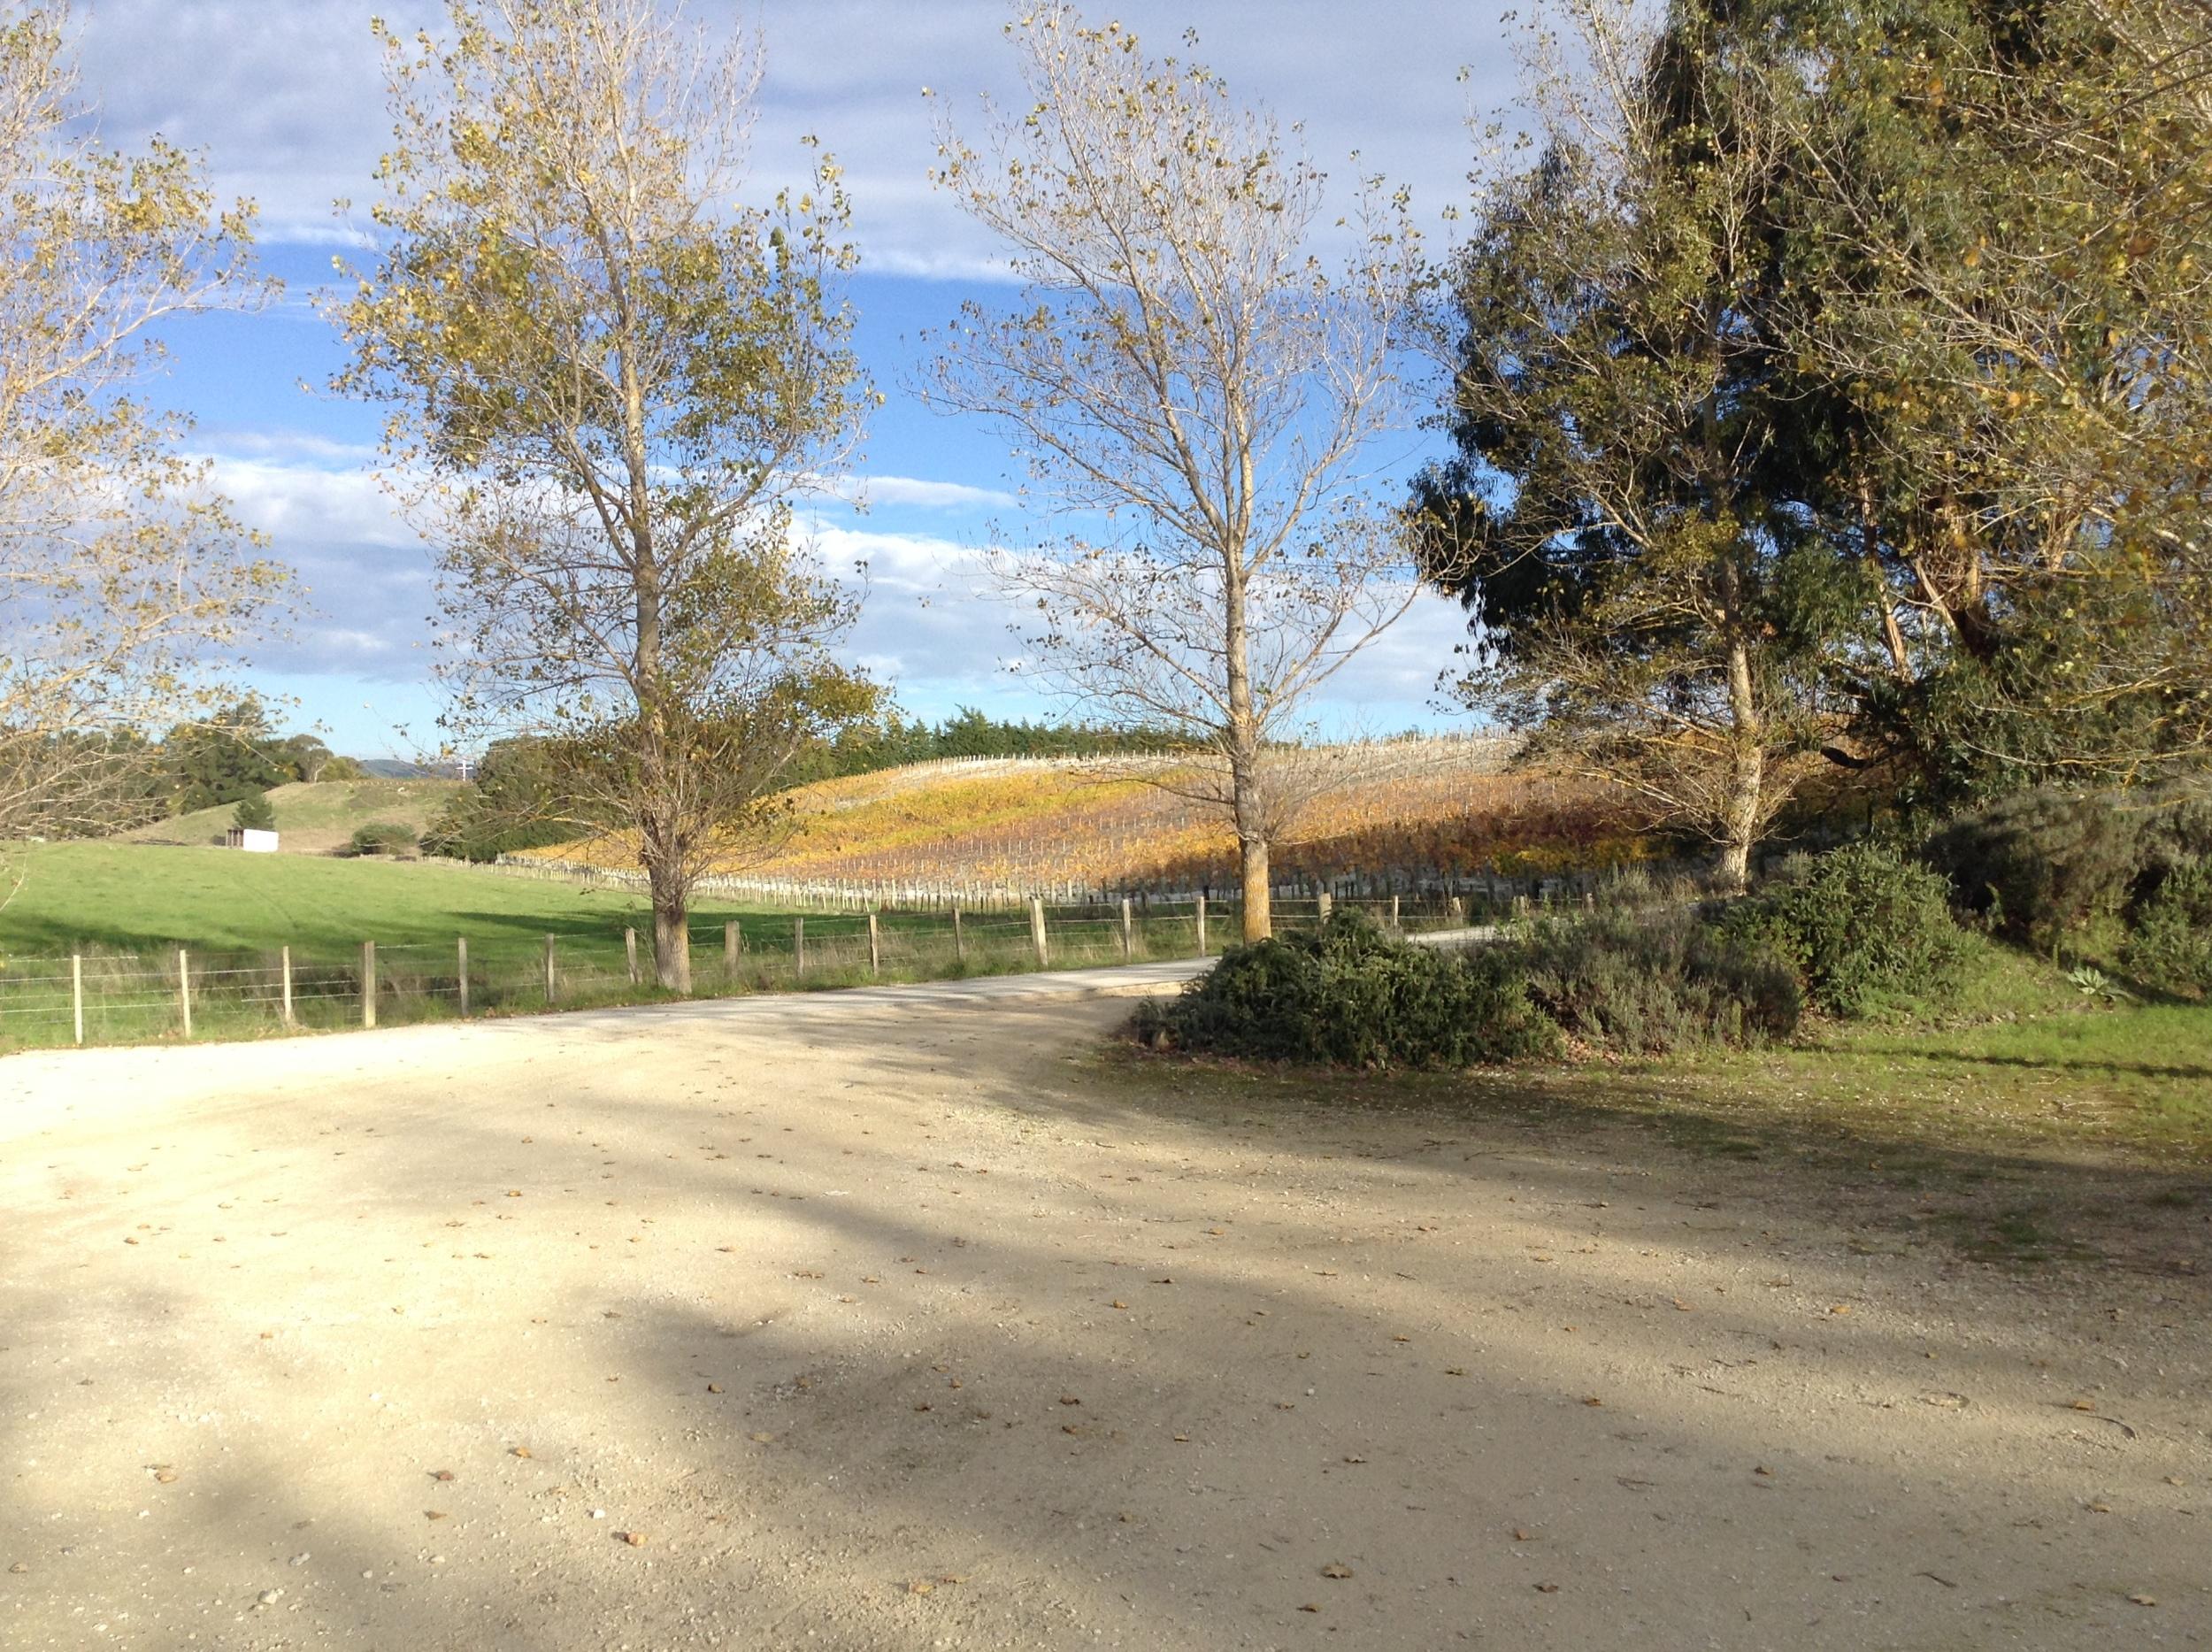 Autumn colours in the hillside vineyard.